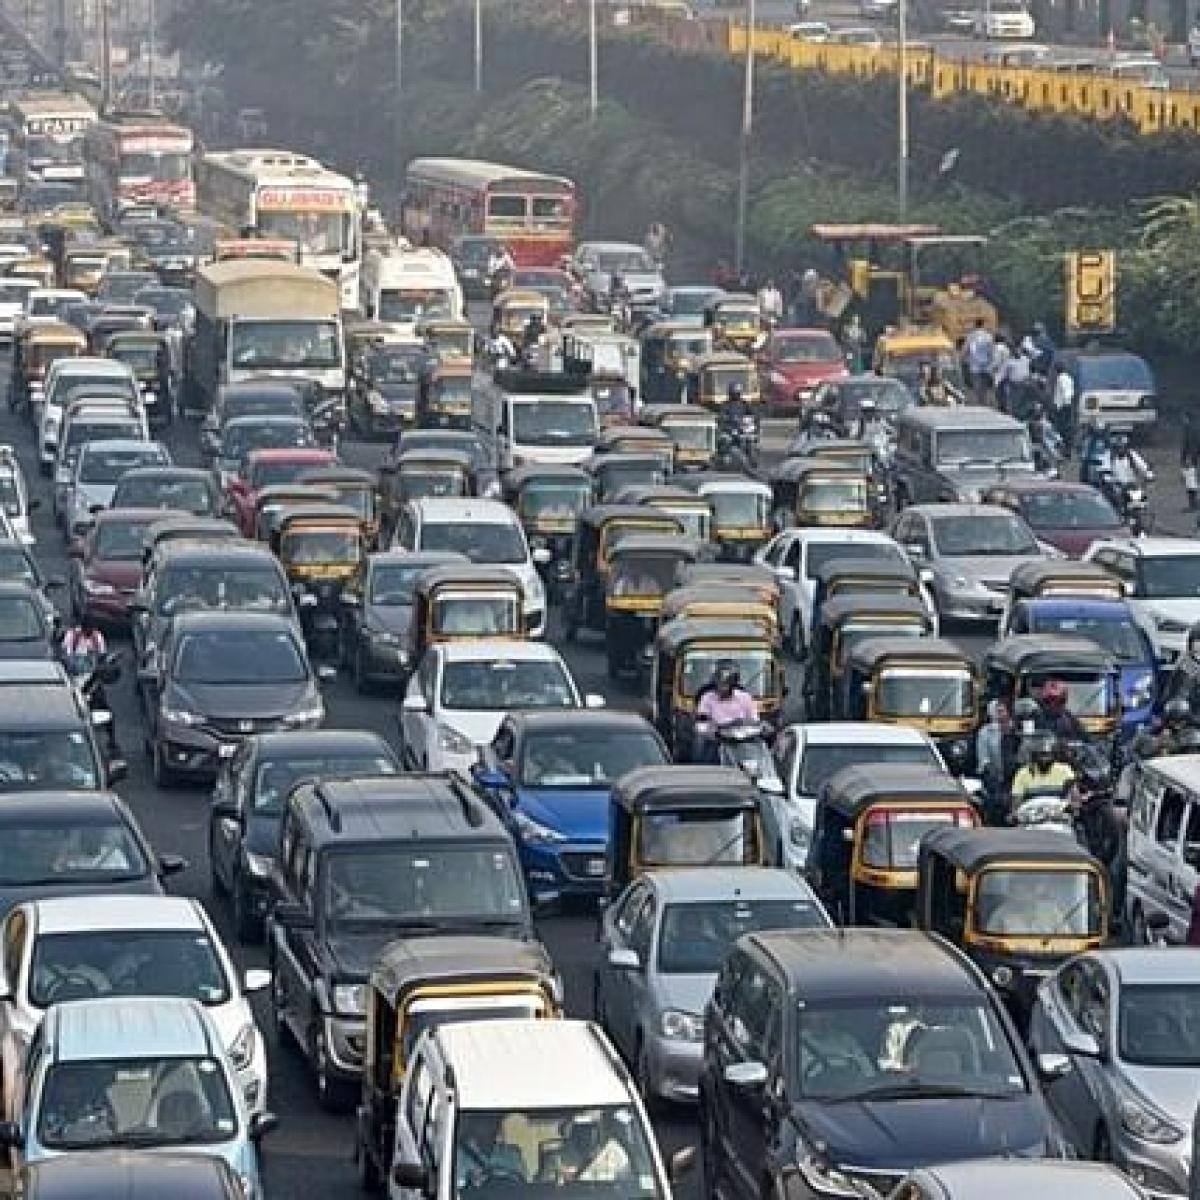 Mumbai Traffic Update: List of roads closed for repair on July 4, 2020